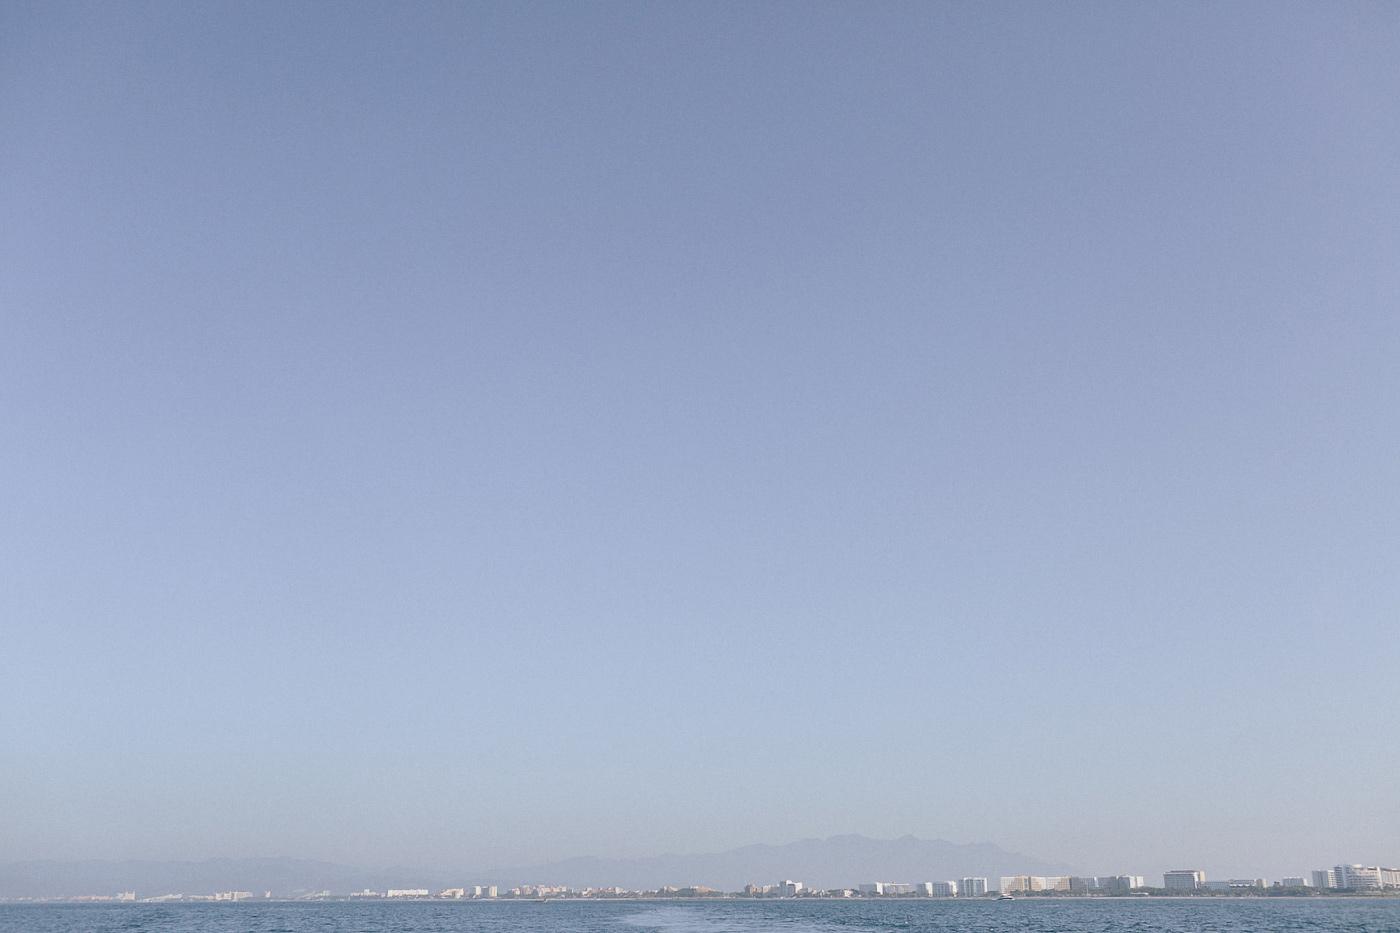 166-puerto-vallarta-mexico-coast.jpg